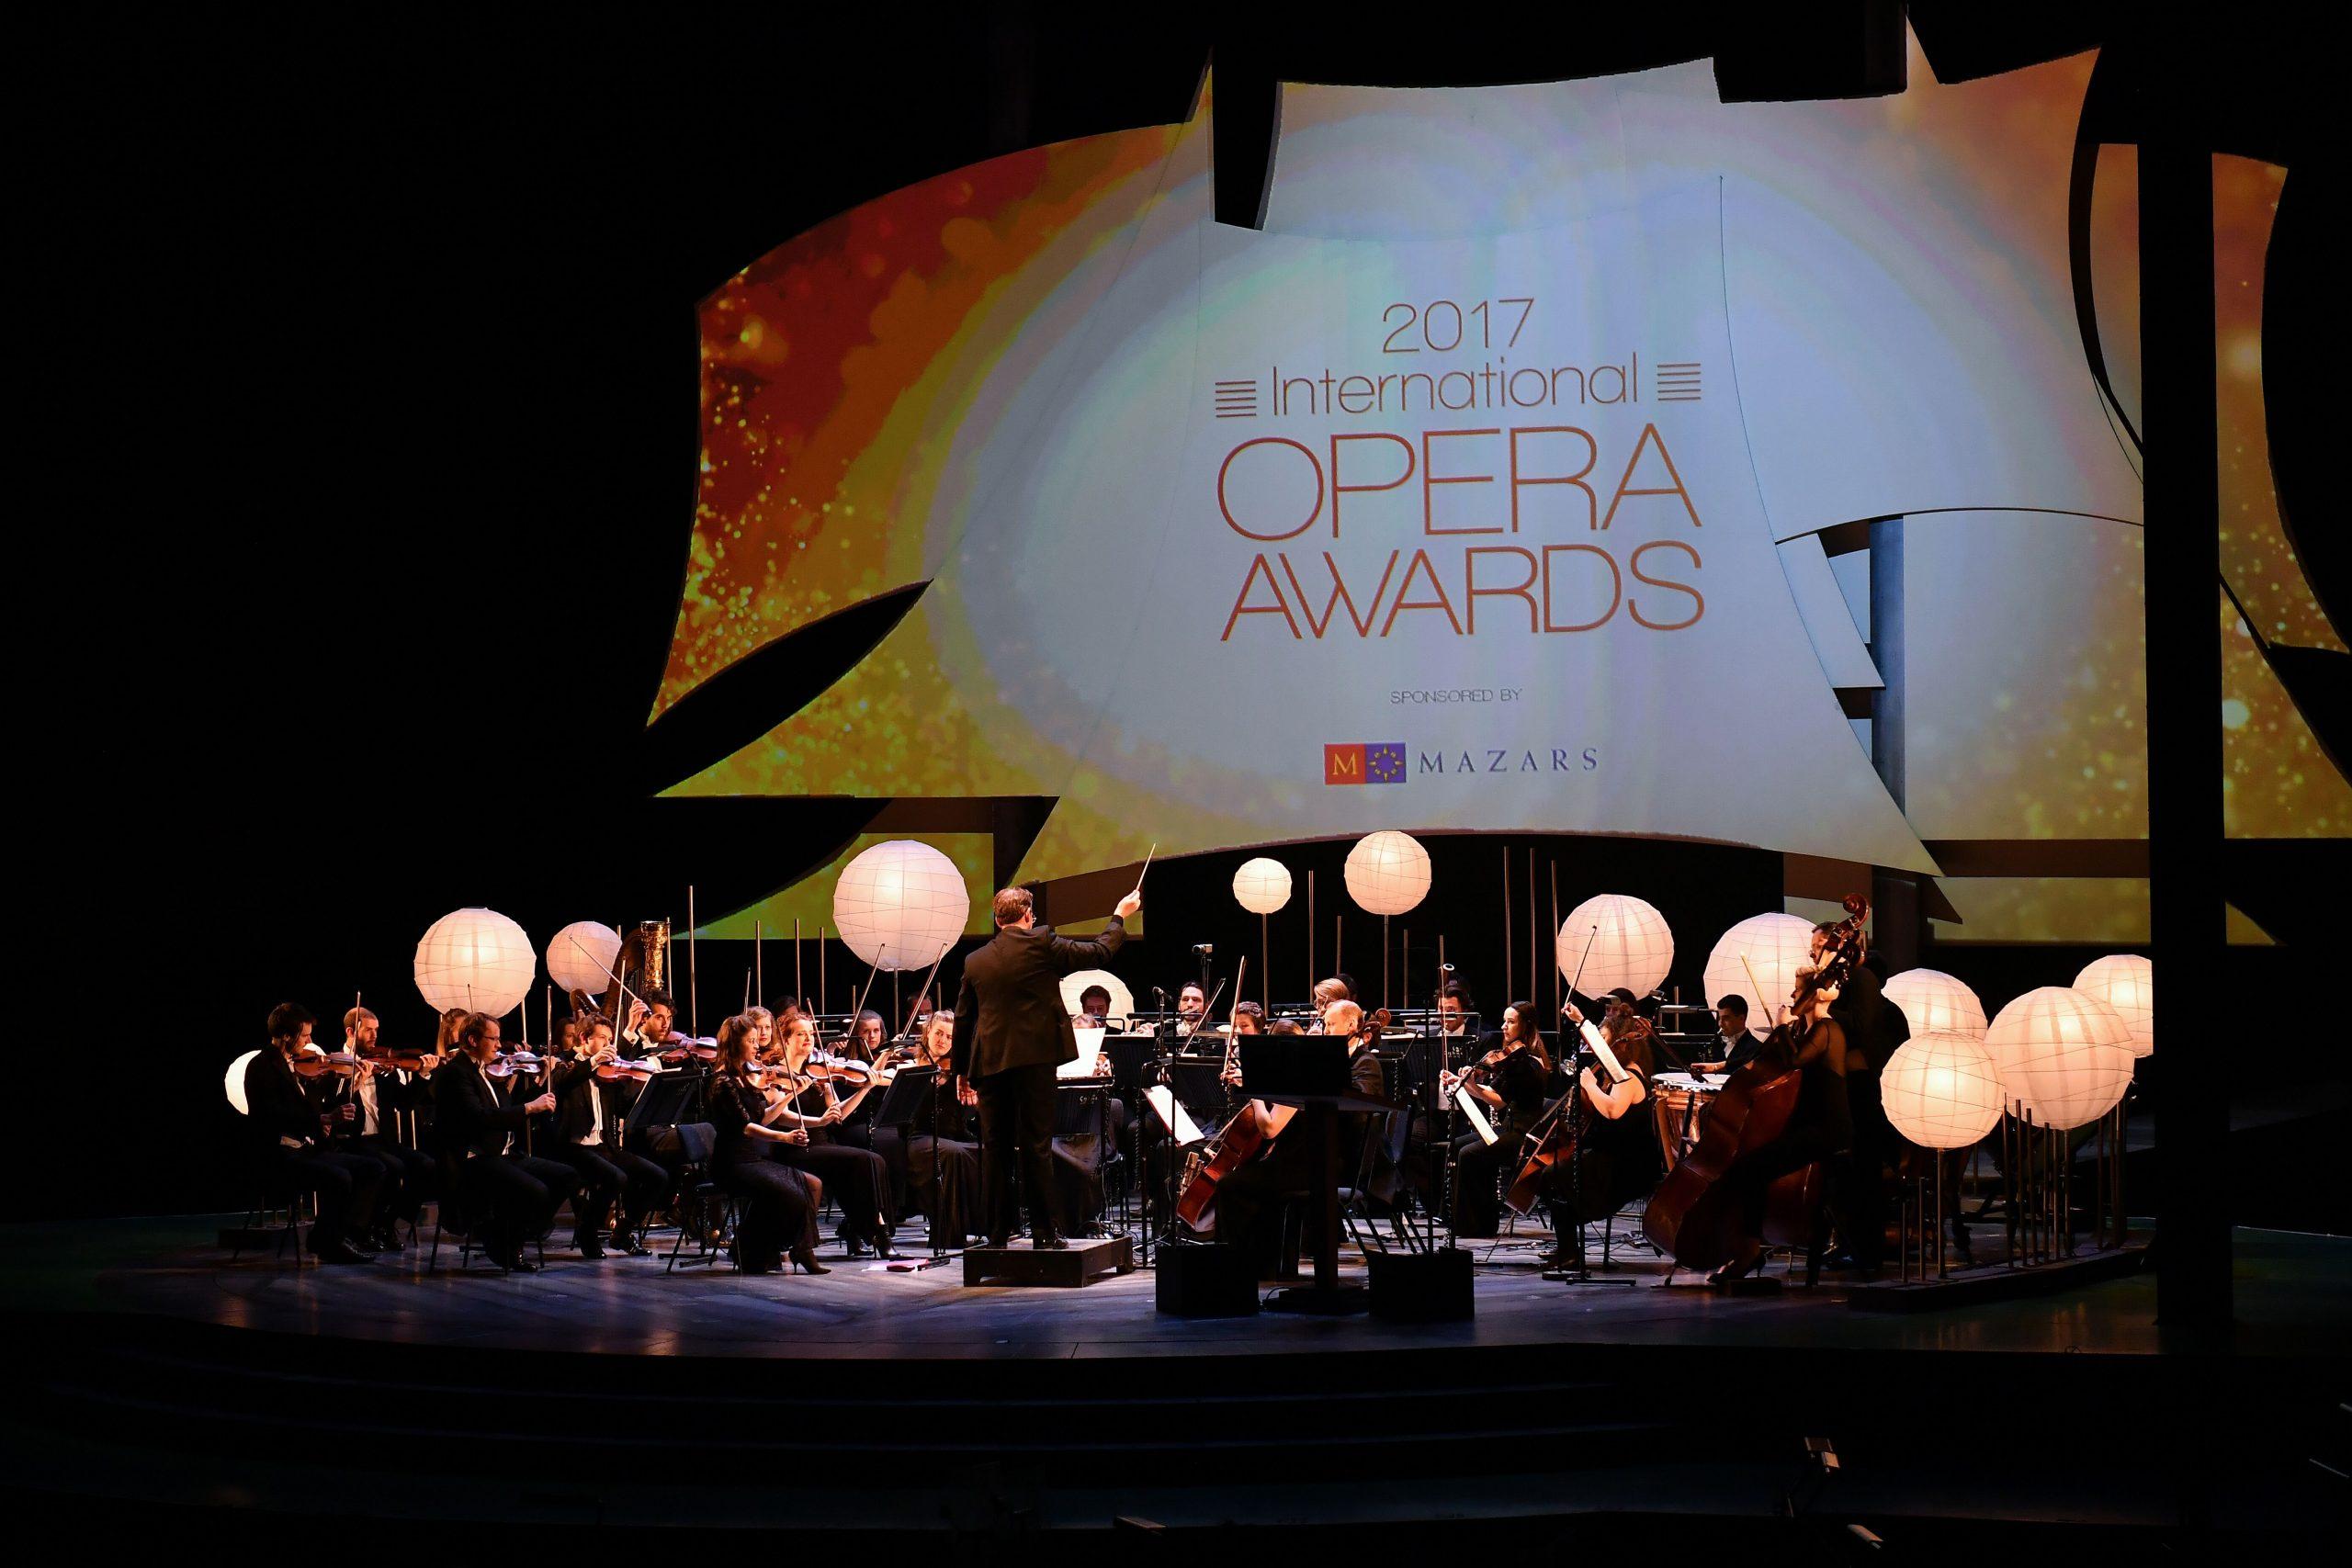 Orpheus Sinfonia International Opera Awards